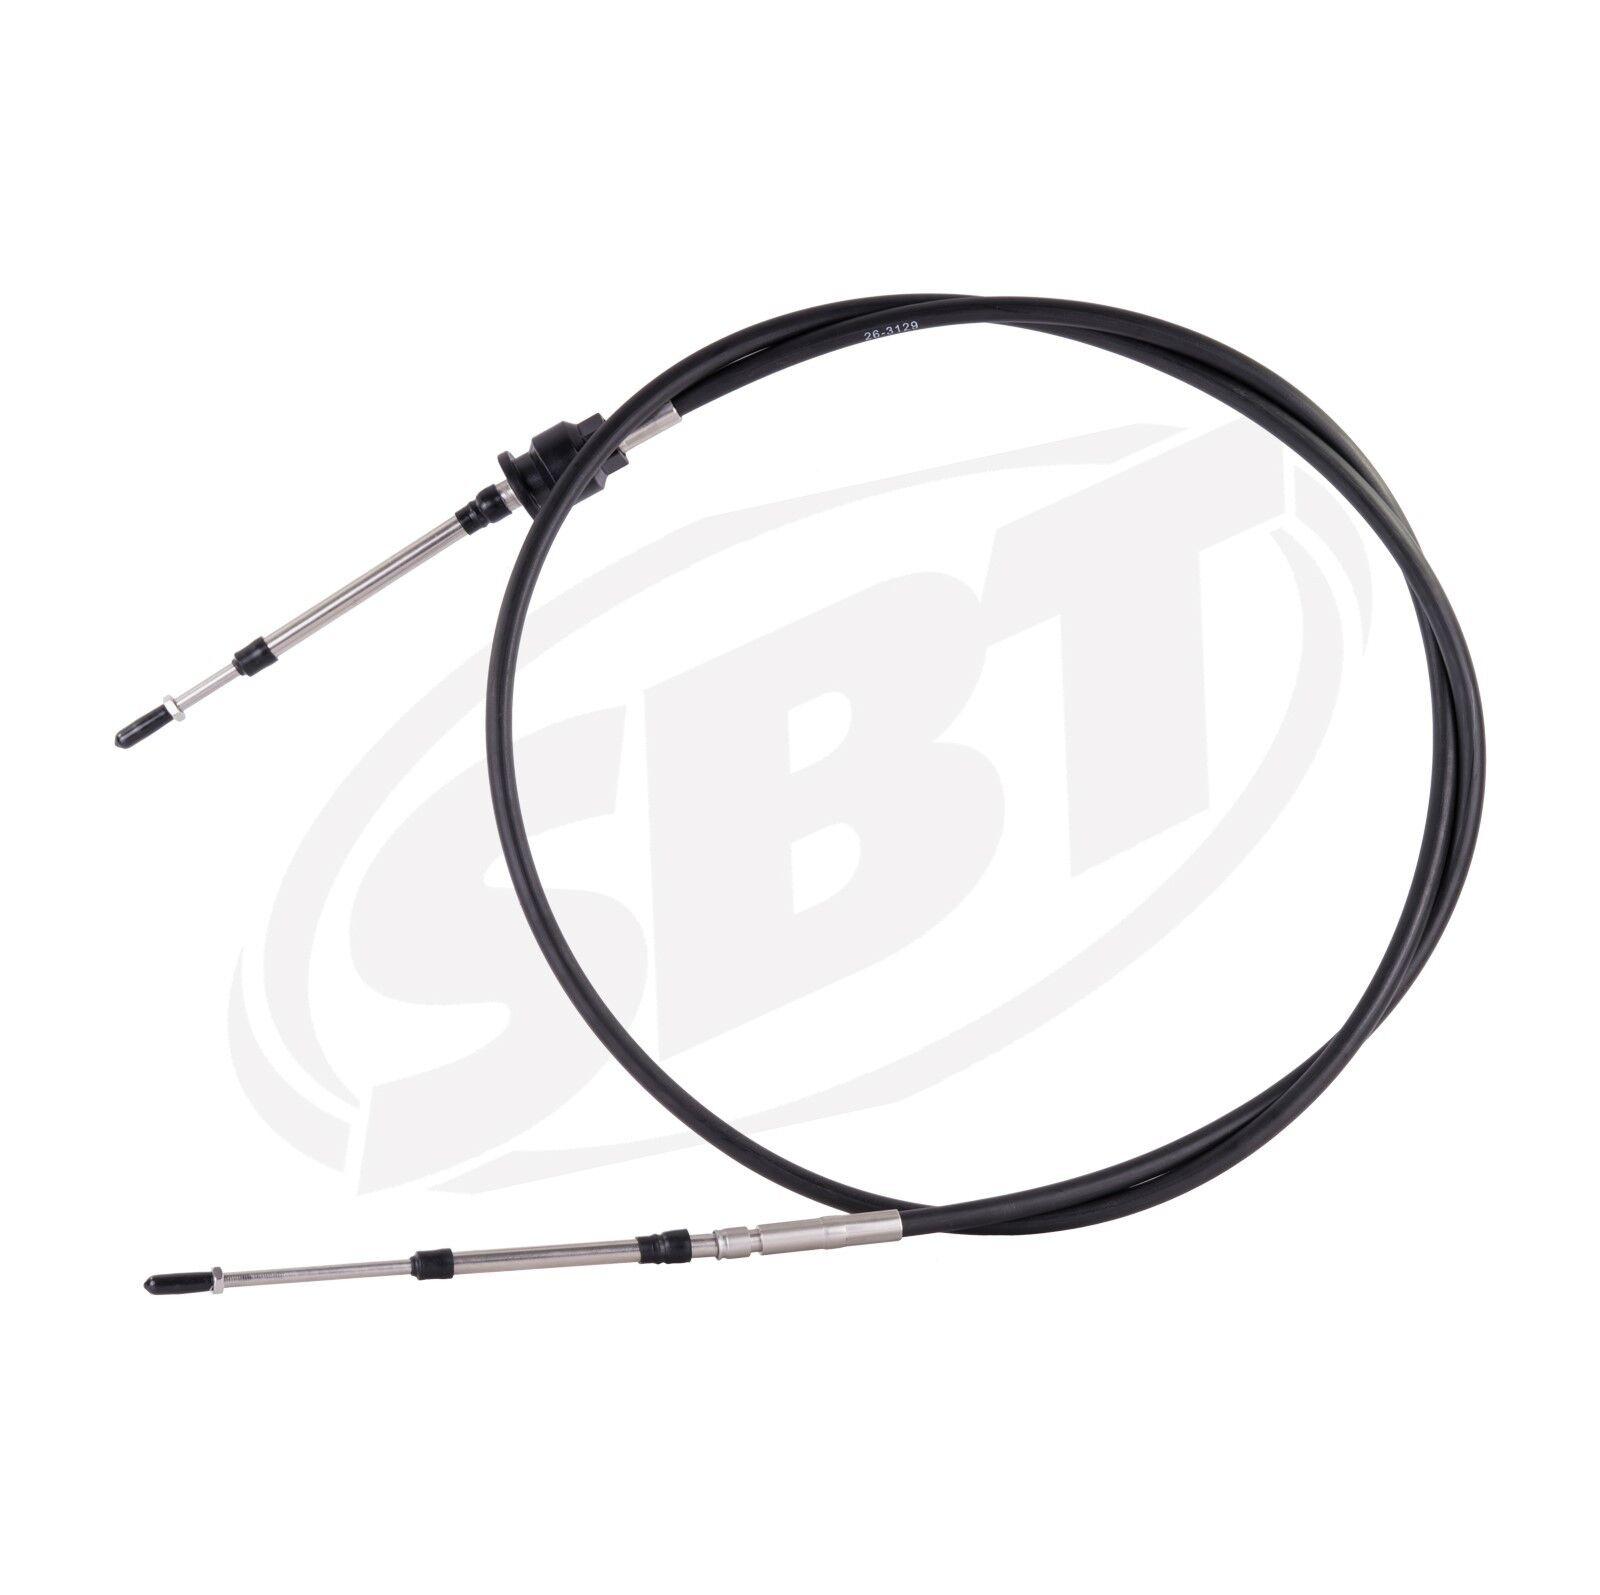 Seadoo Steering Cable GTX DI/GTX 4TEC/155/215 RXT